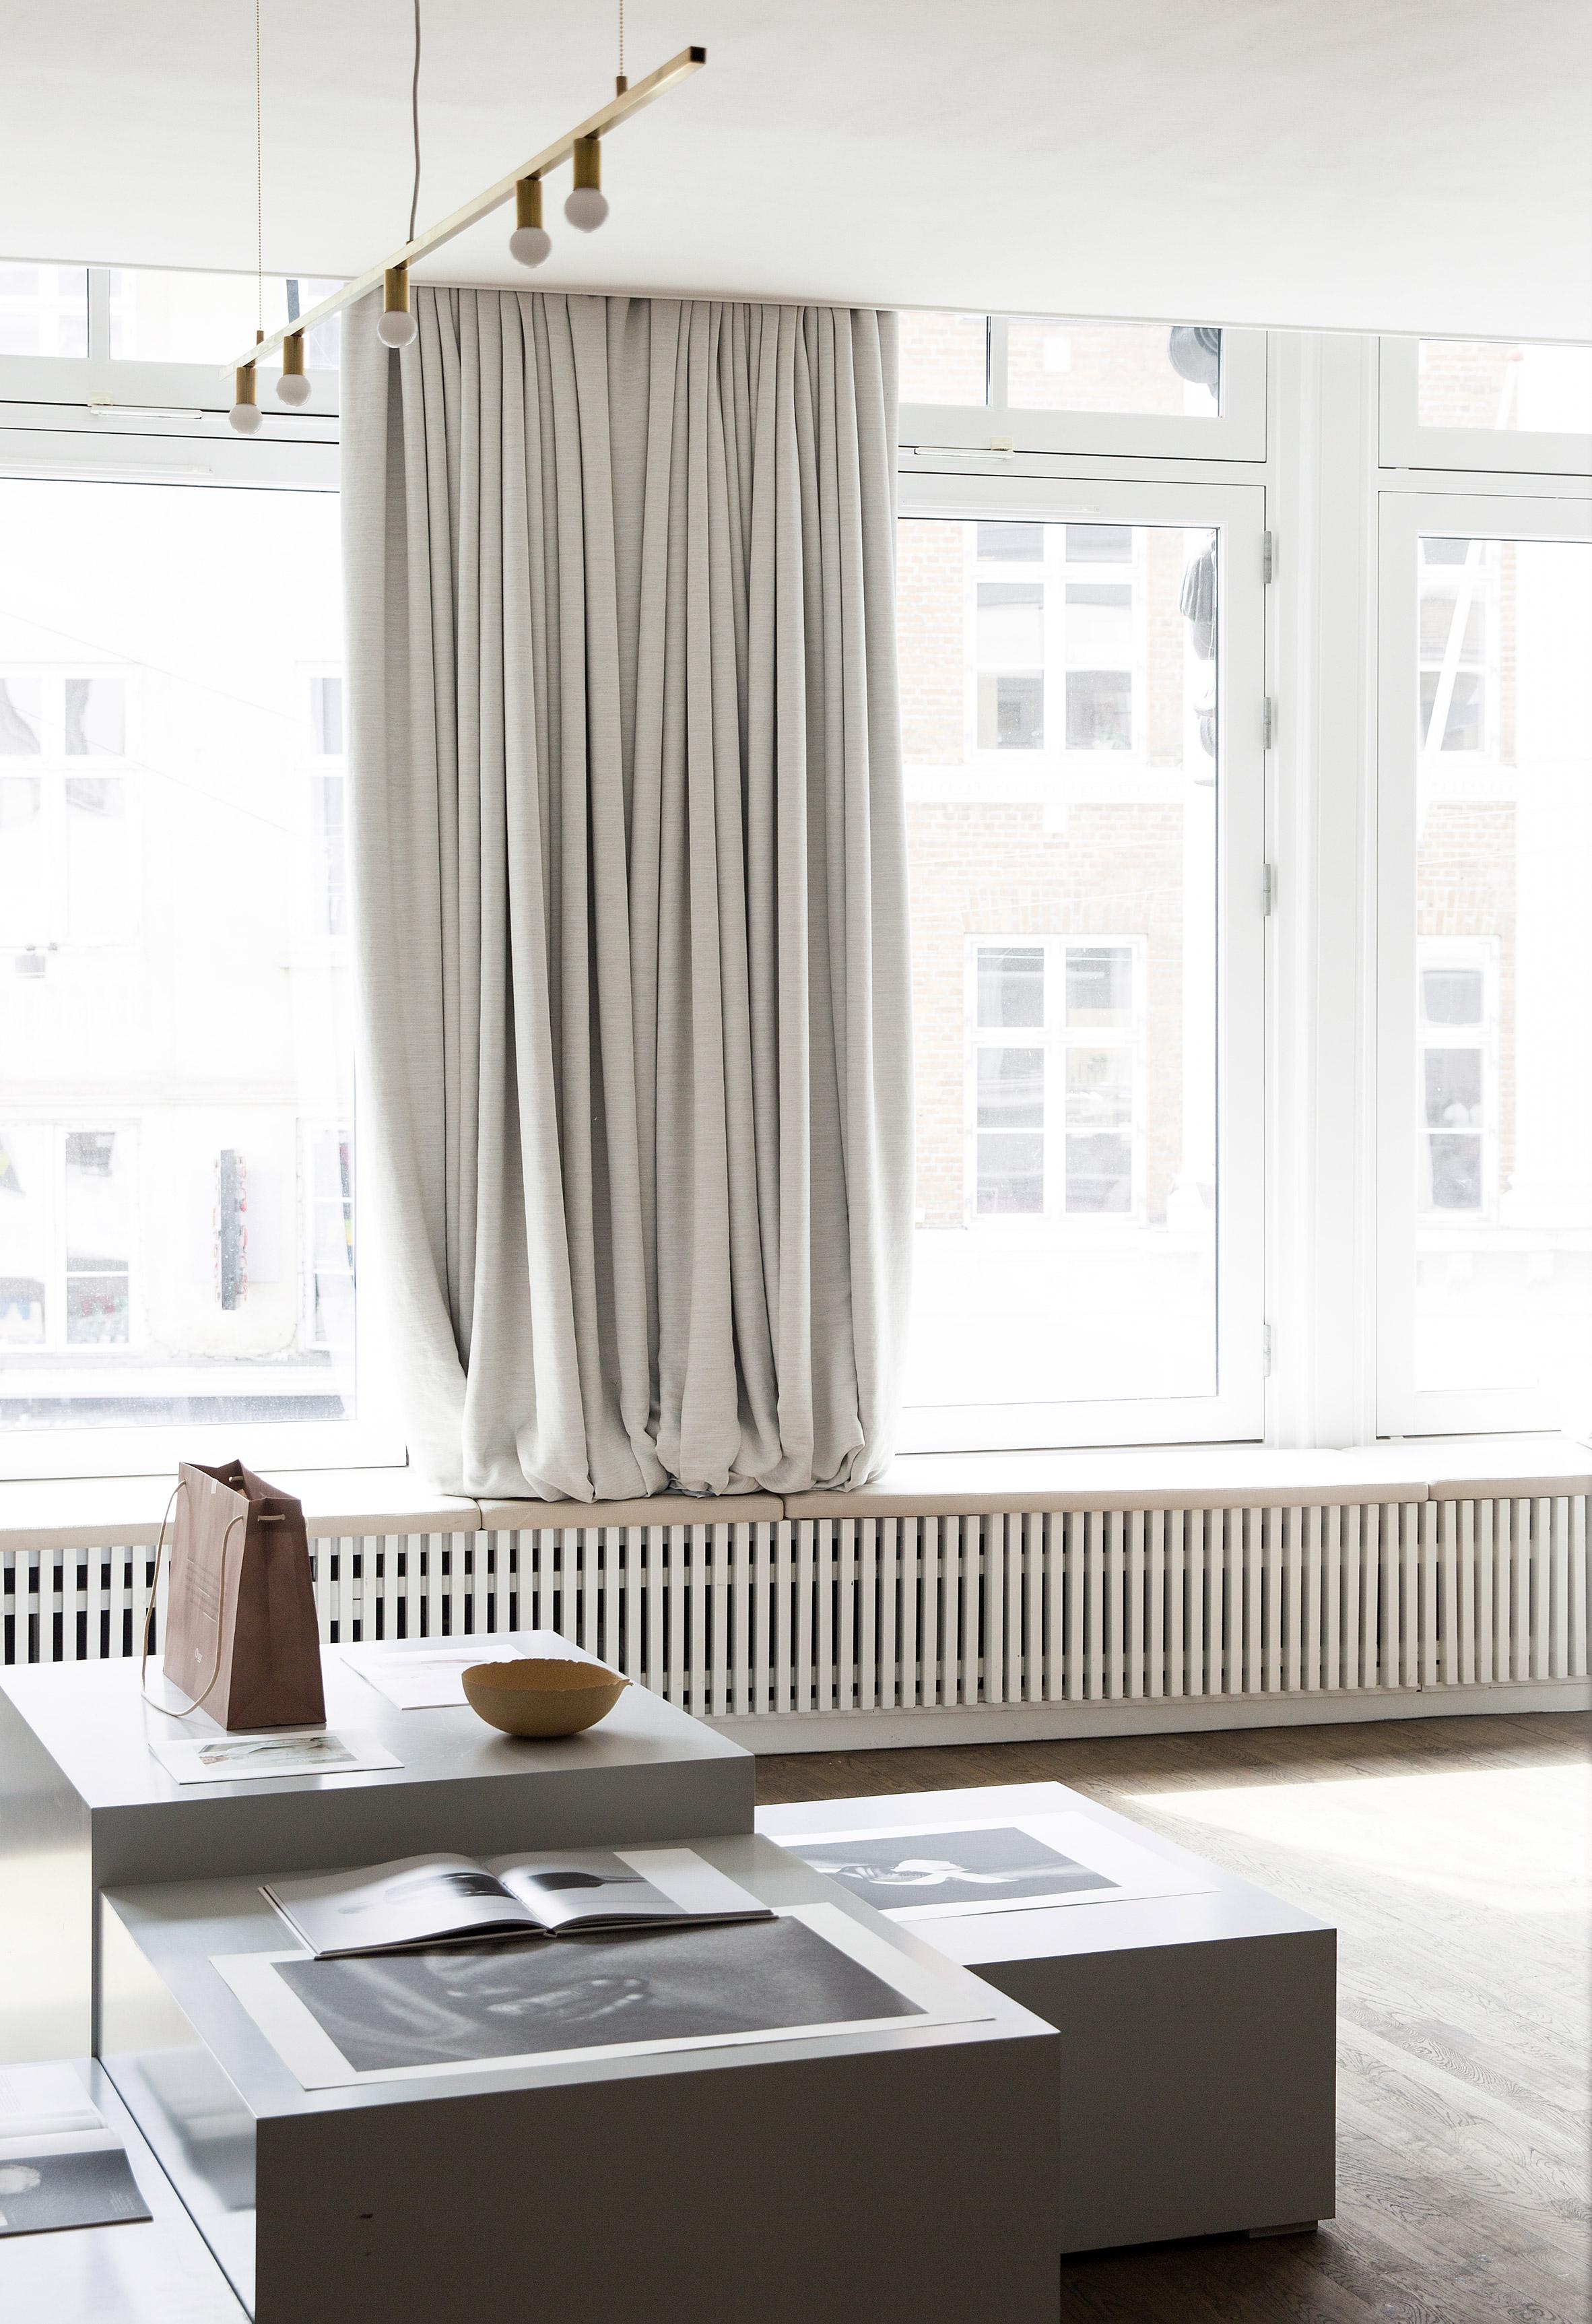 kinfolk-office_norm_architects_interiors_gallery_copenhagen_dezeen_2364_col_5.jpg